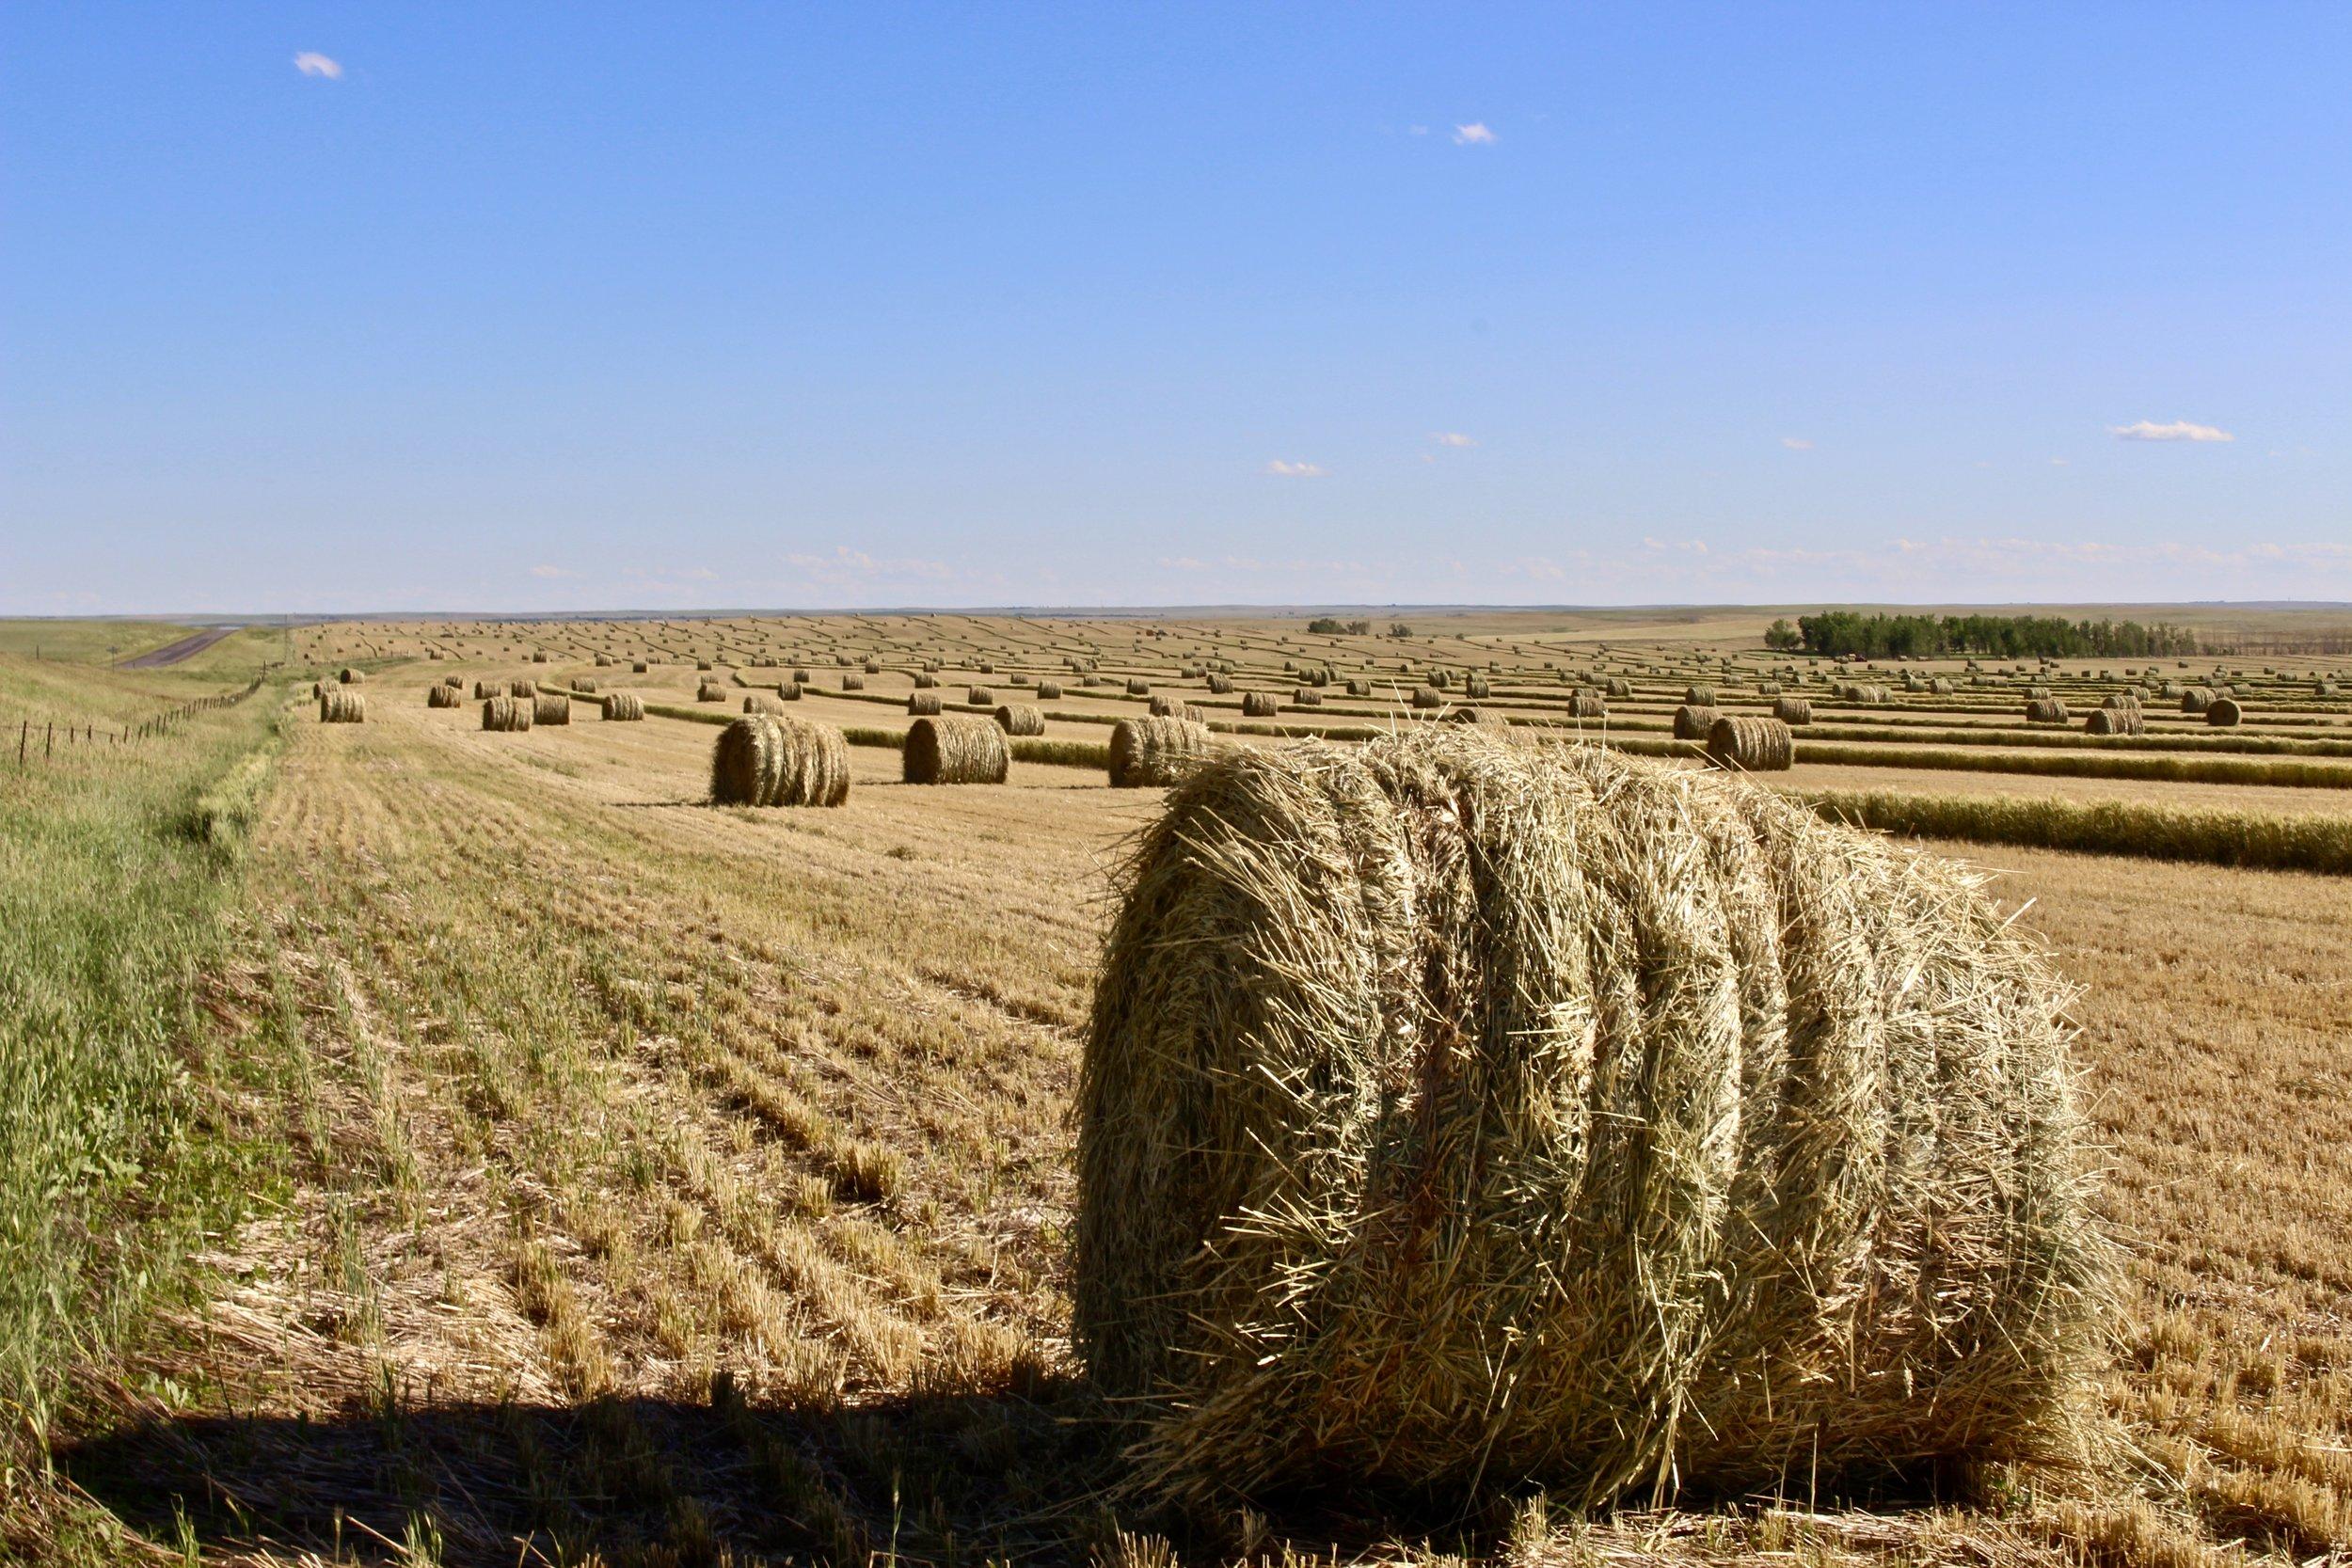 Hay bales sit in dry fields